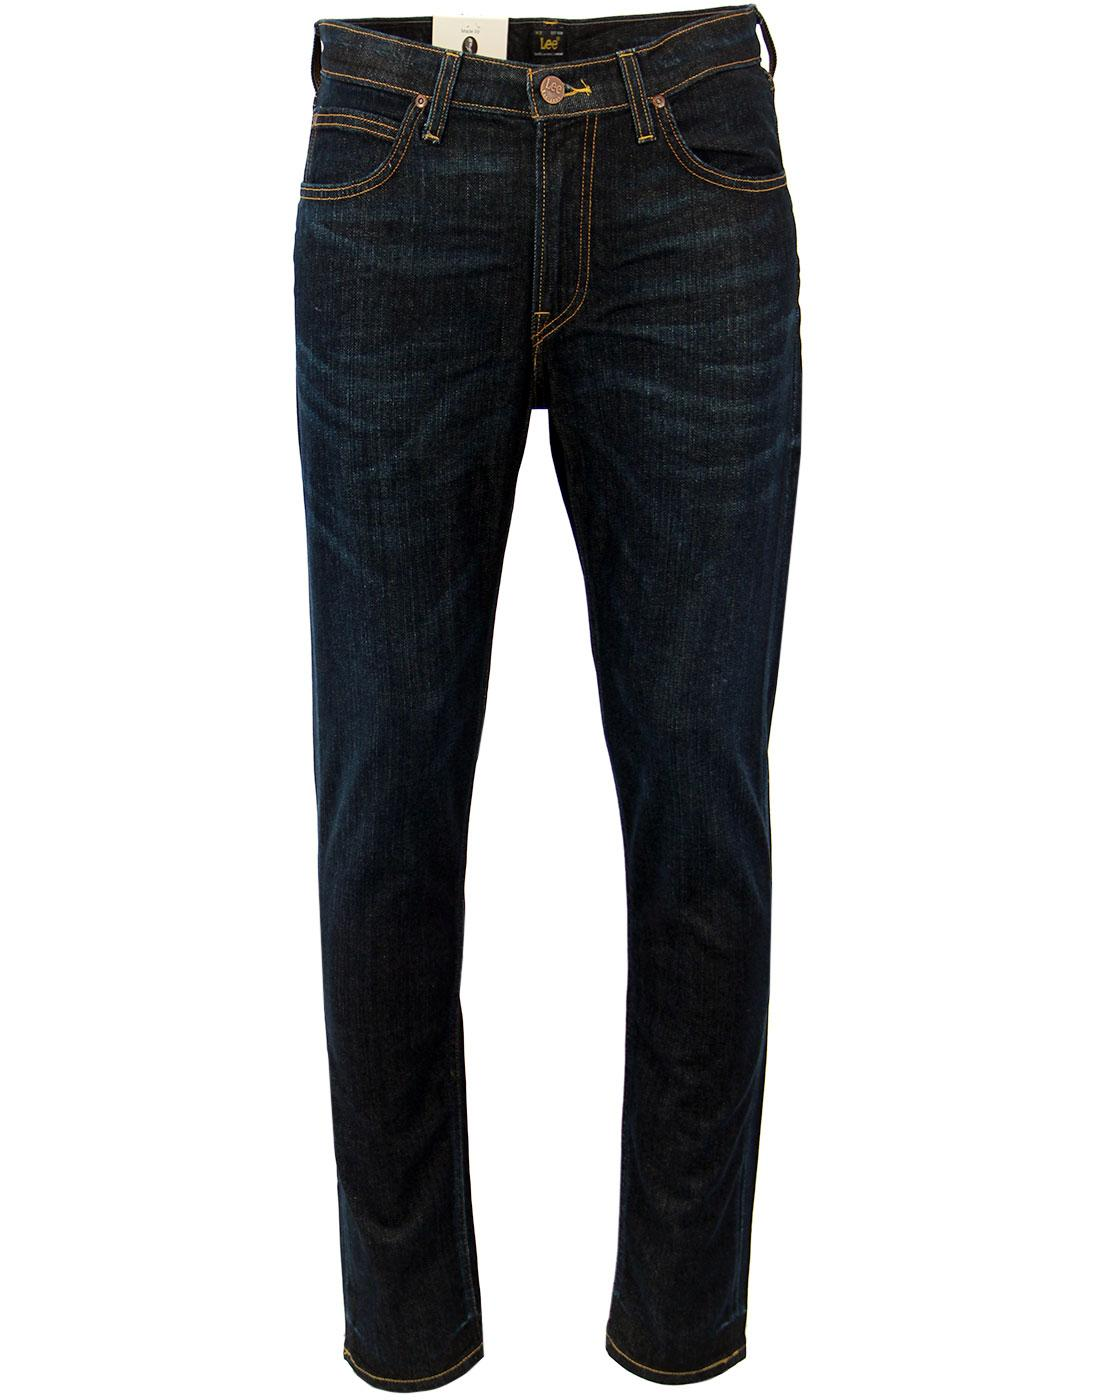 10c8aa1a Arvin LEE Retro Mod Regular Tapered Denim Jeans in Deep Sea